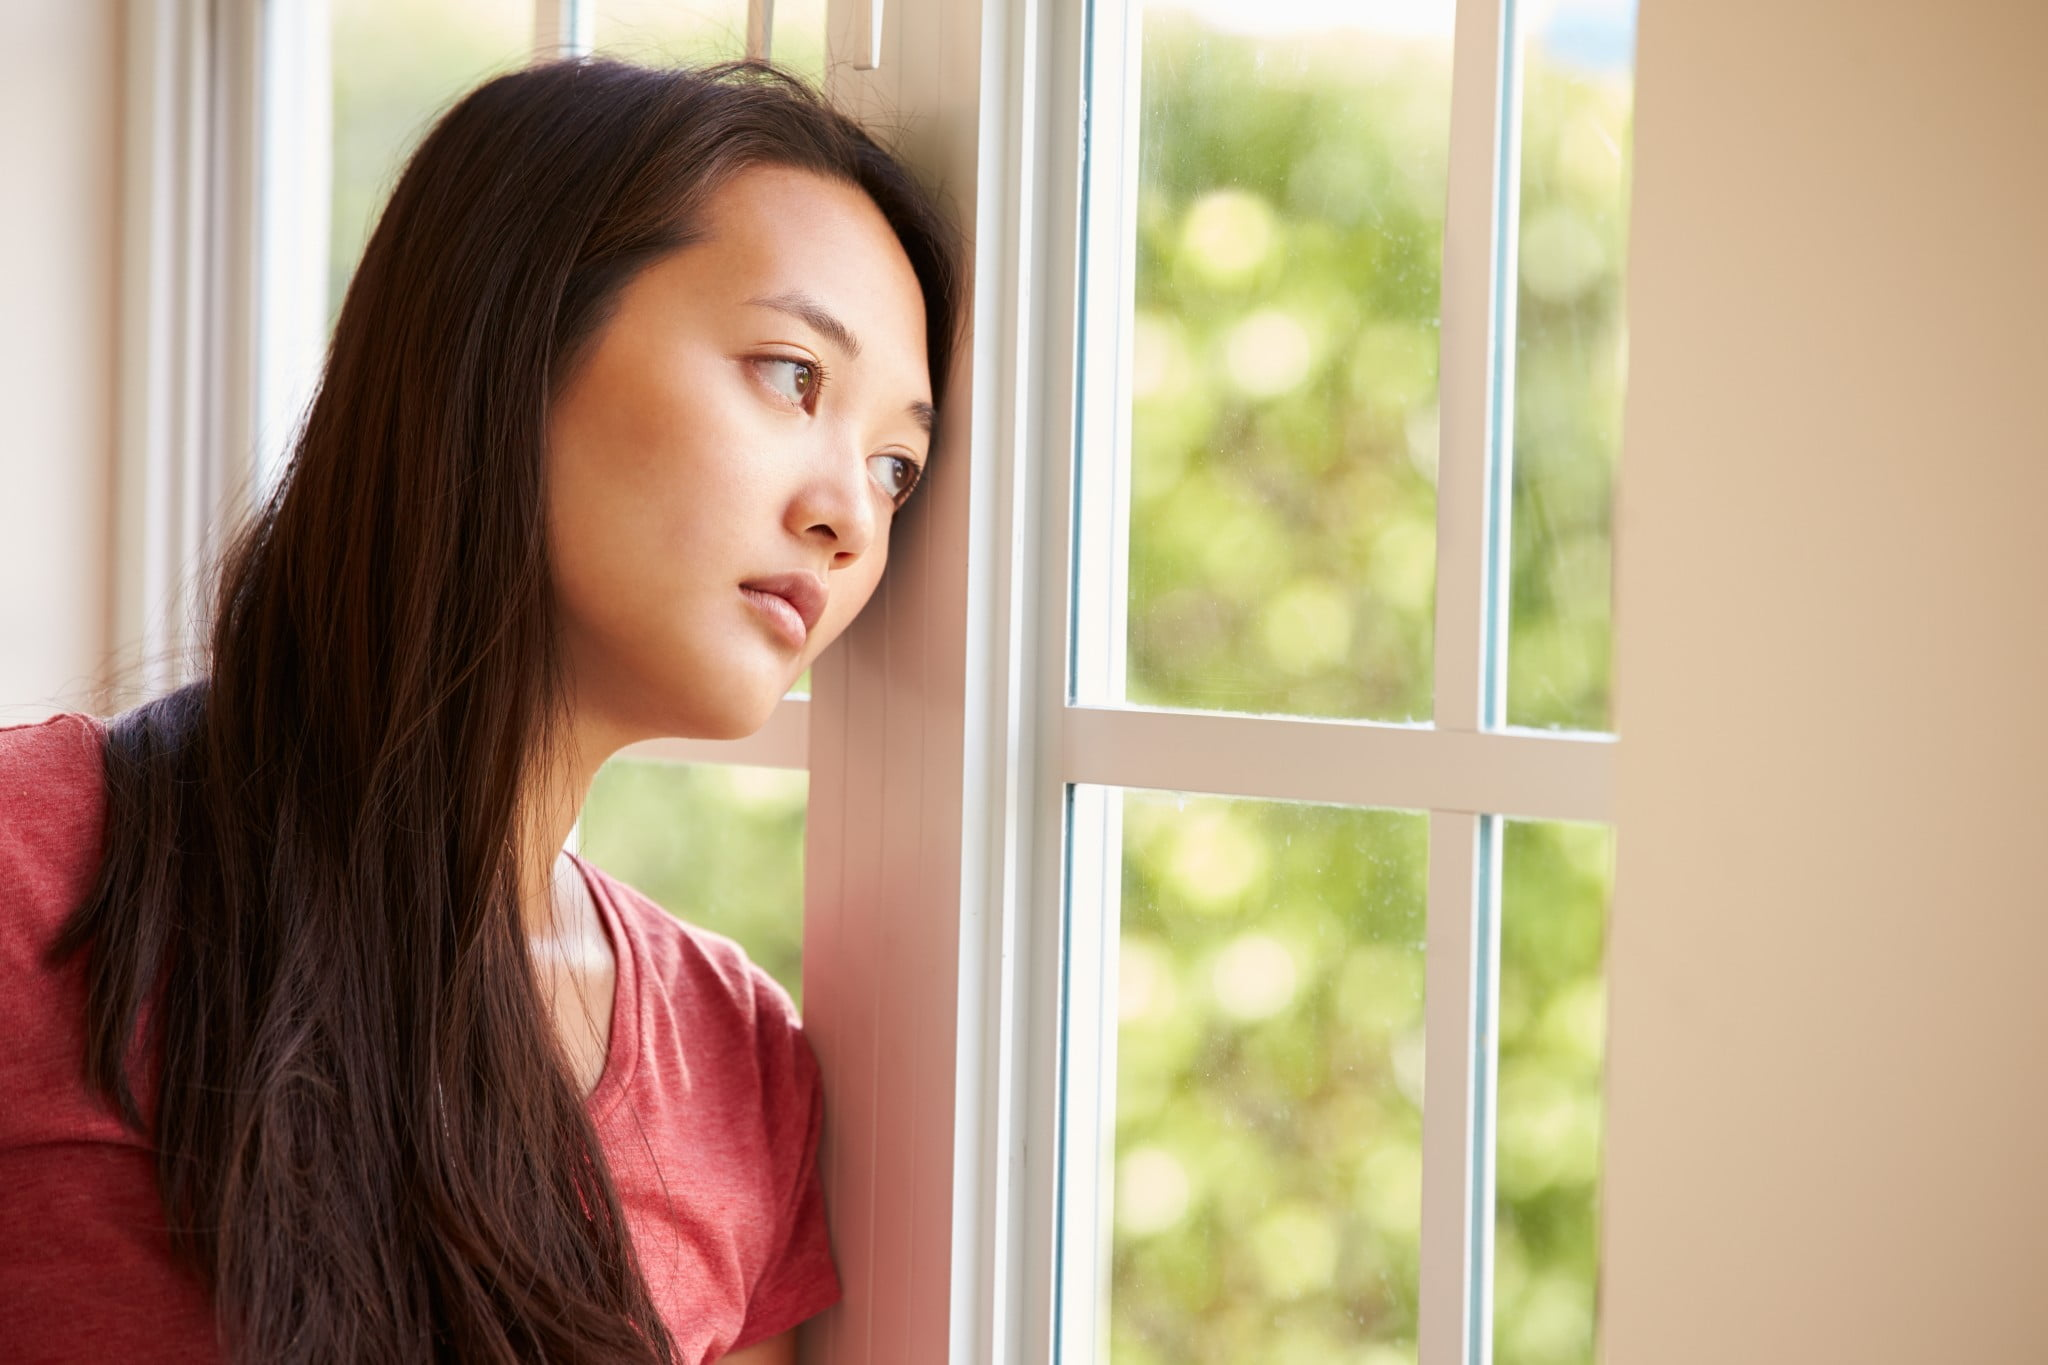 woman gazes out of window